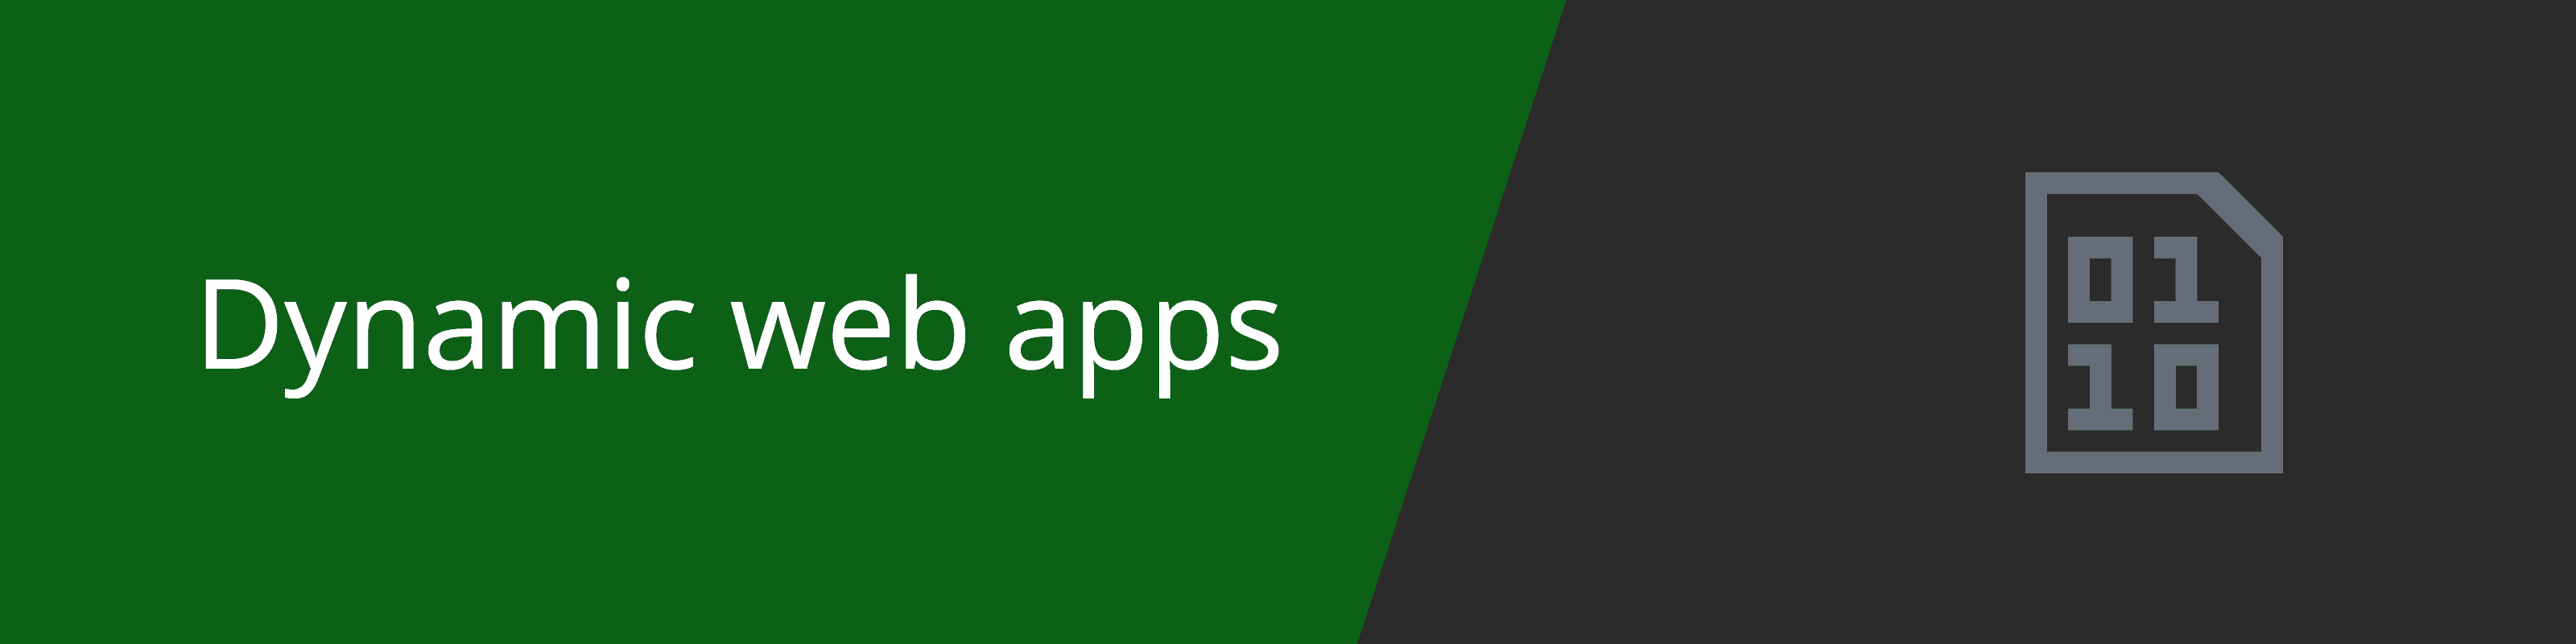 dynamic web apps